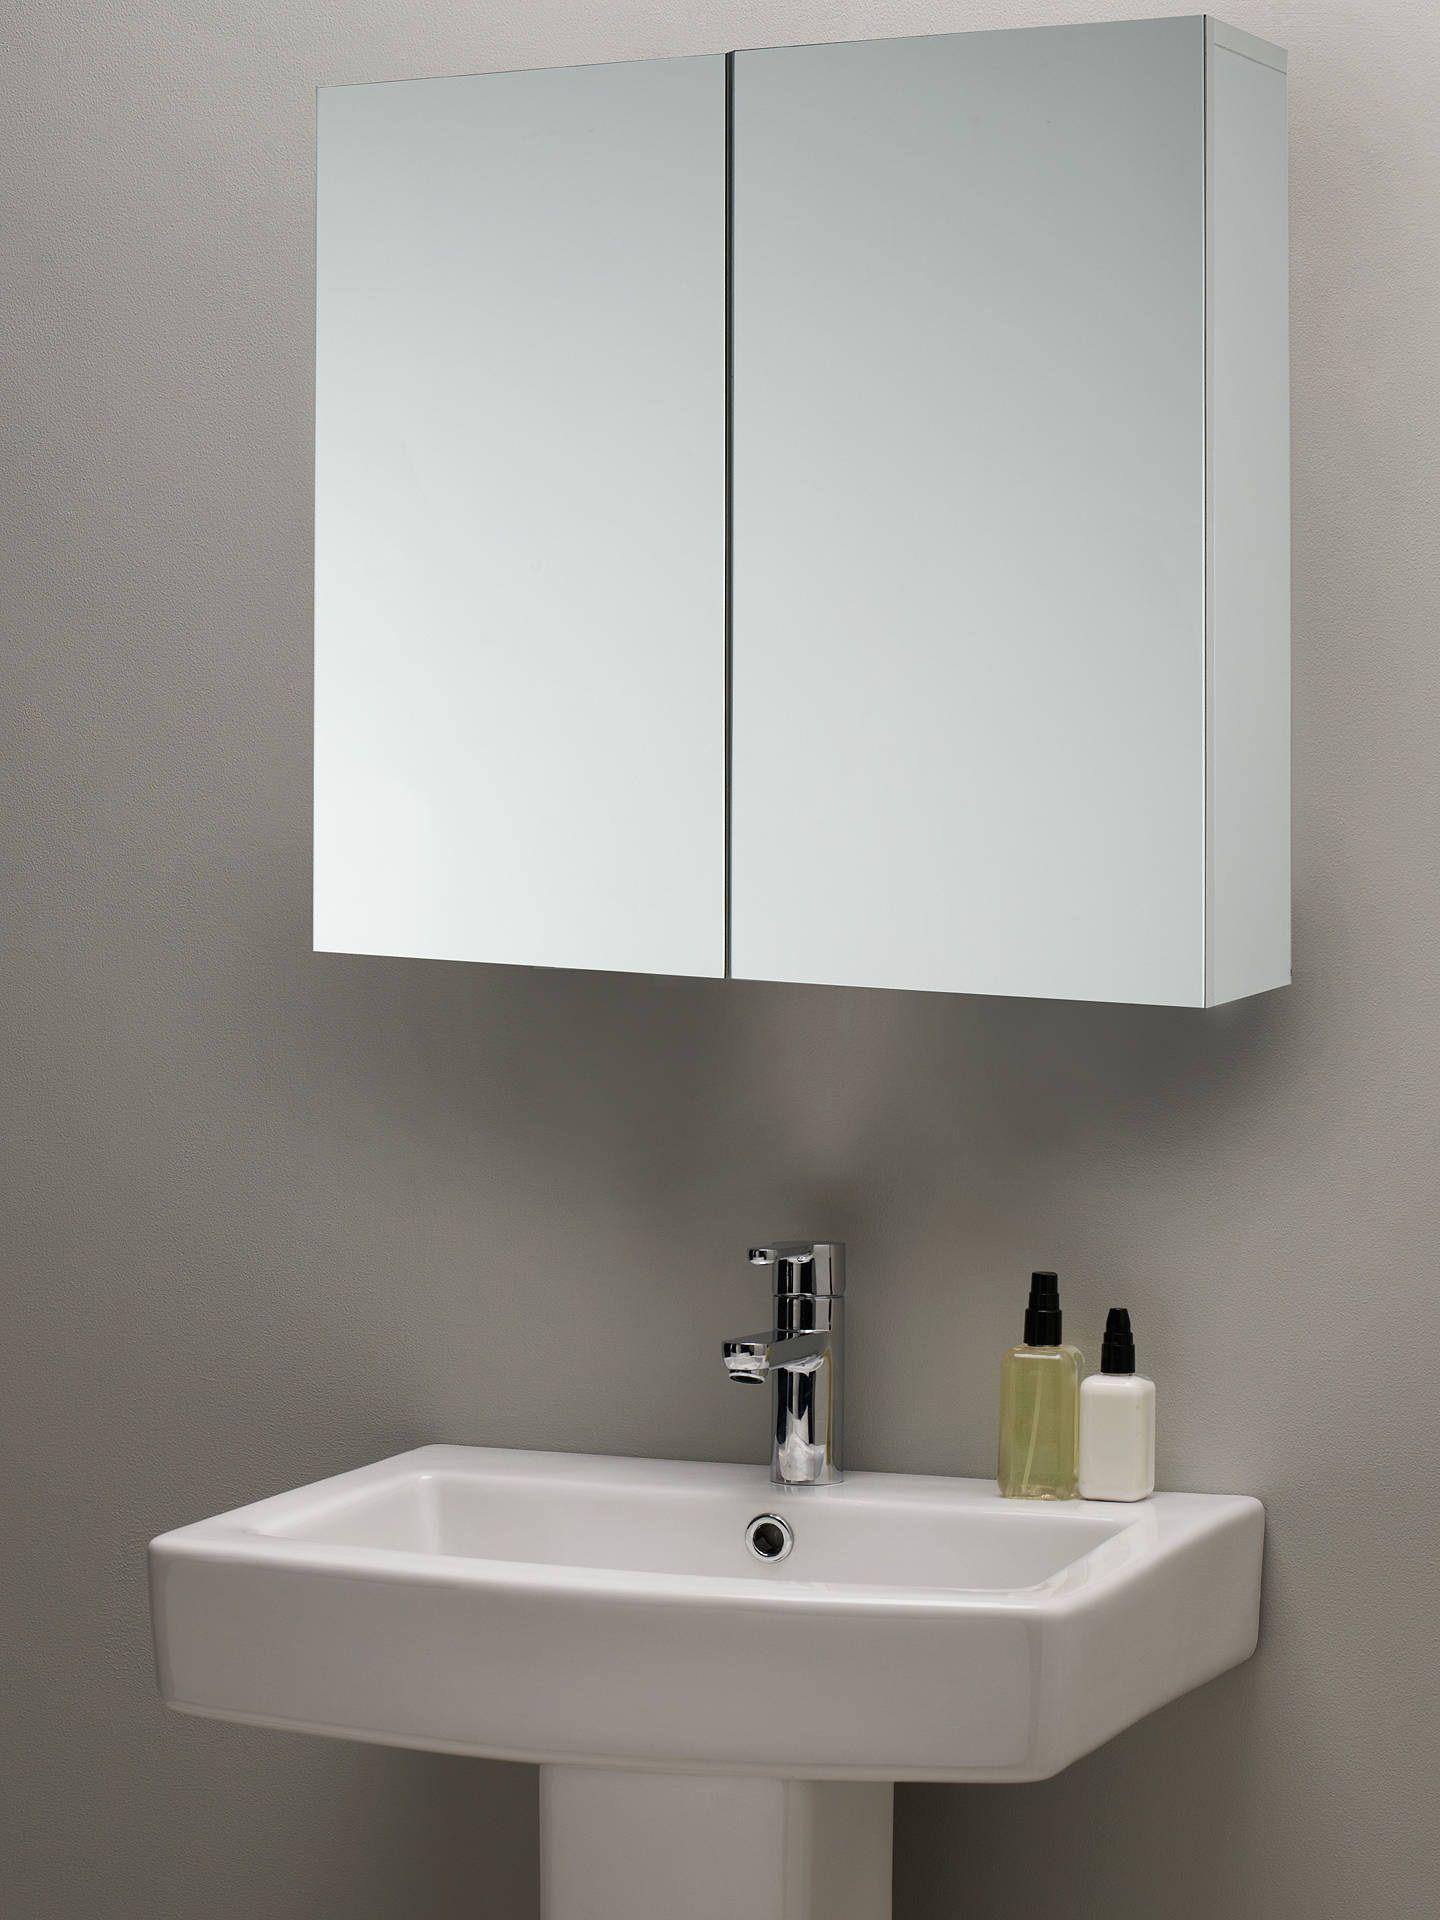 John Lewis Bathroom Cabinet 2021 In 2020 Bathroom Mirror Cabinet White Bathroom Cabinets White Bathroom